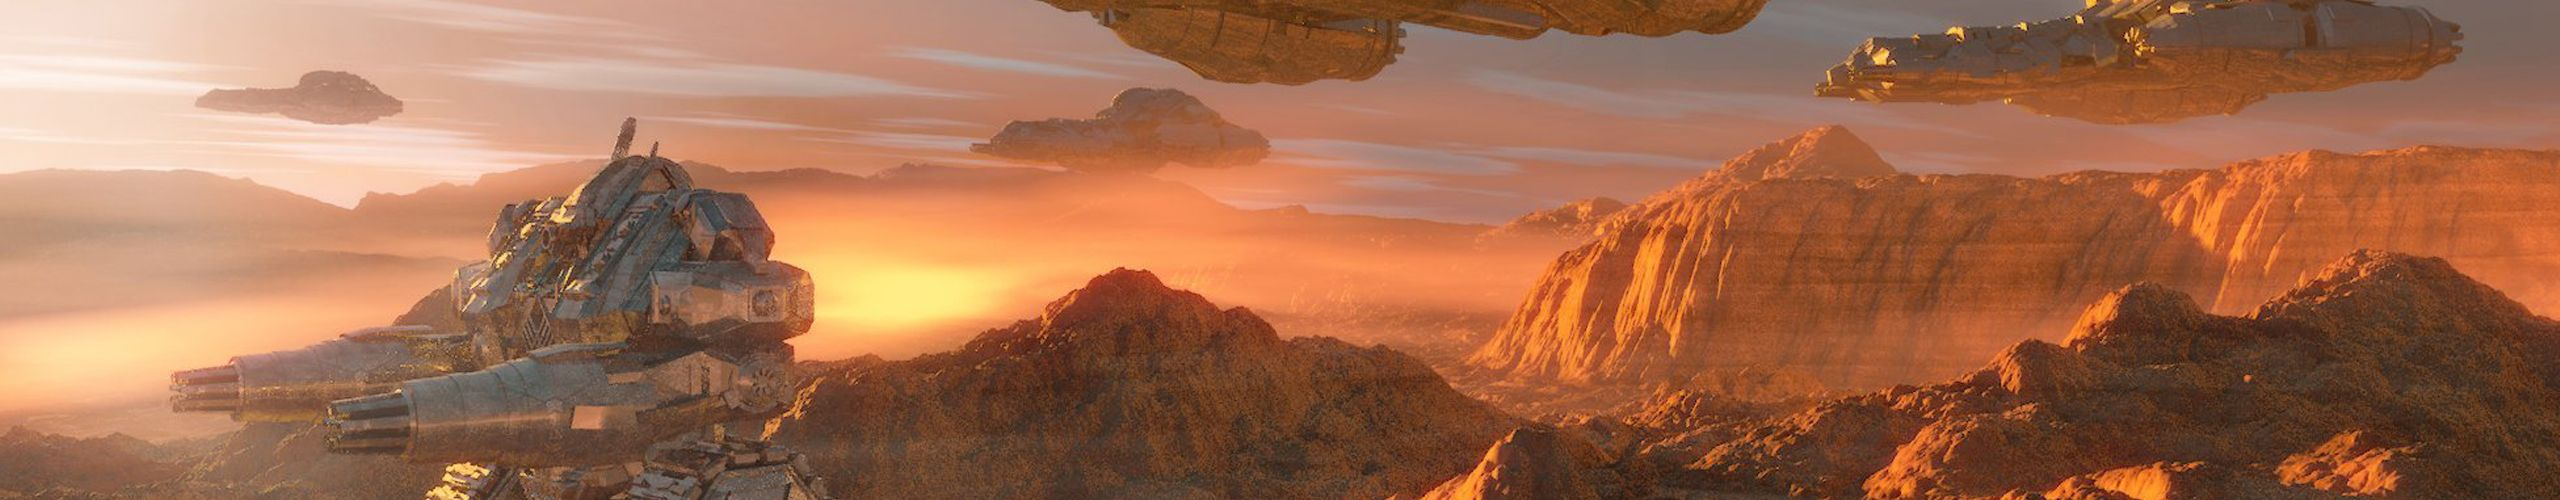 Mars Battle